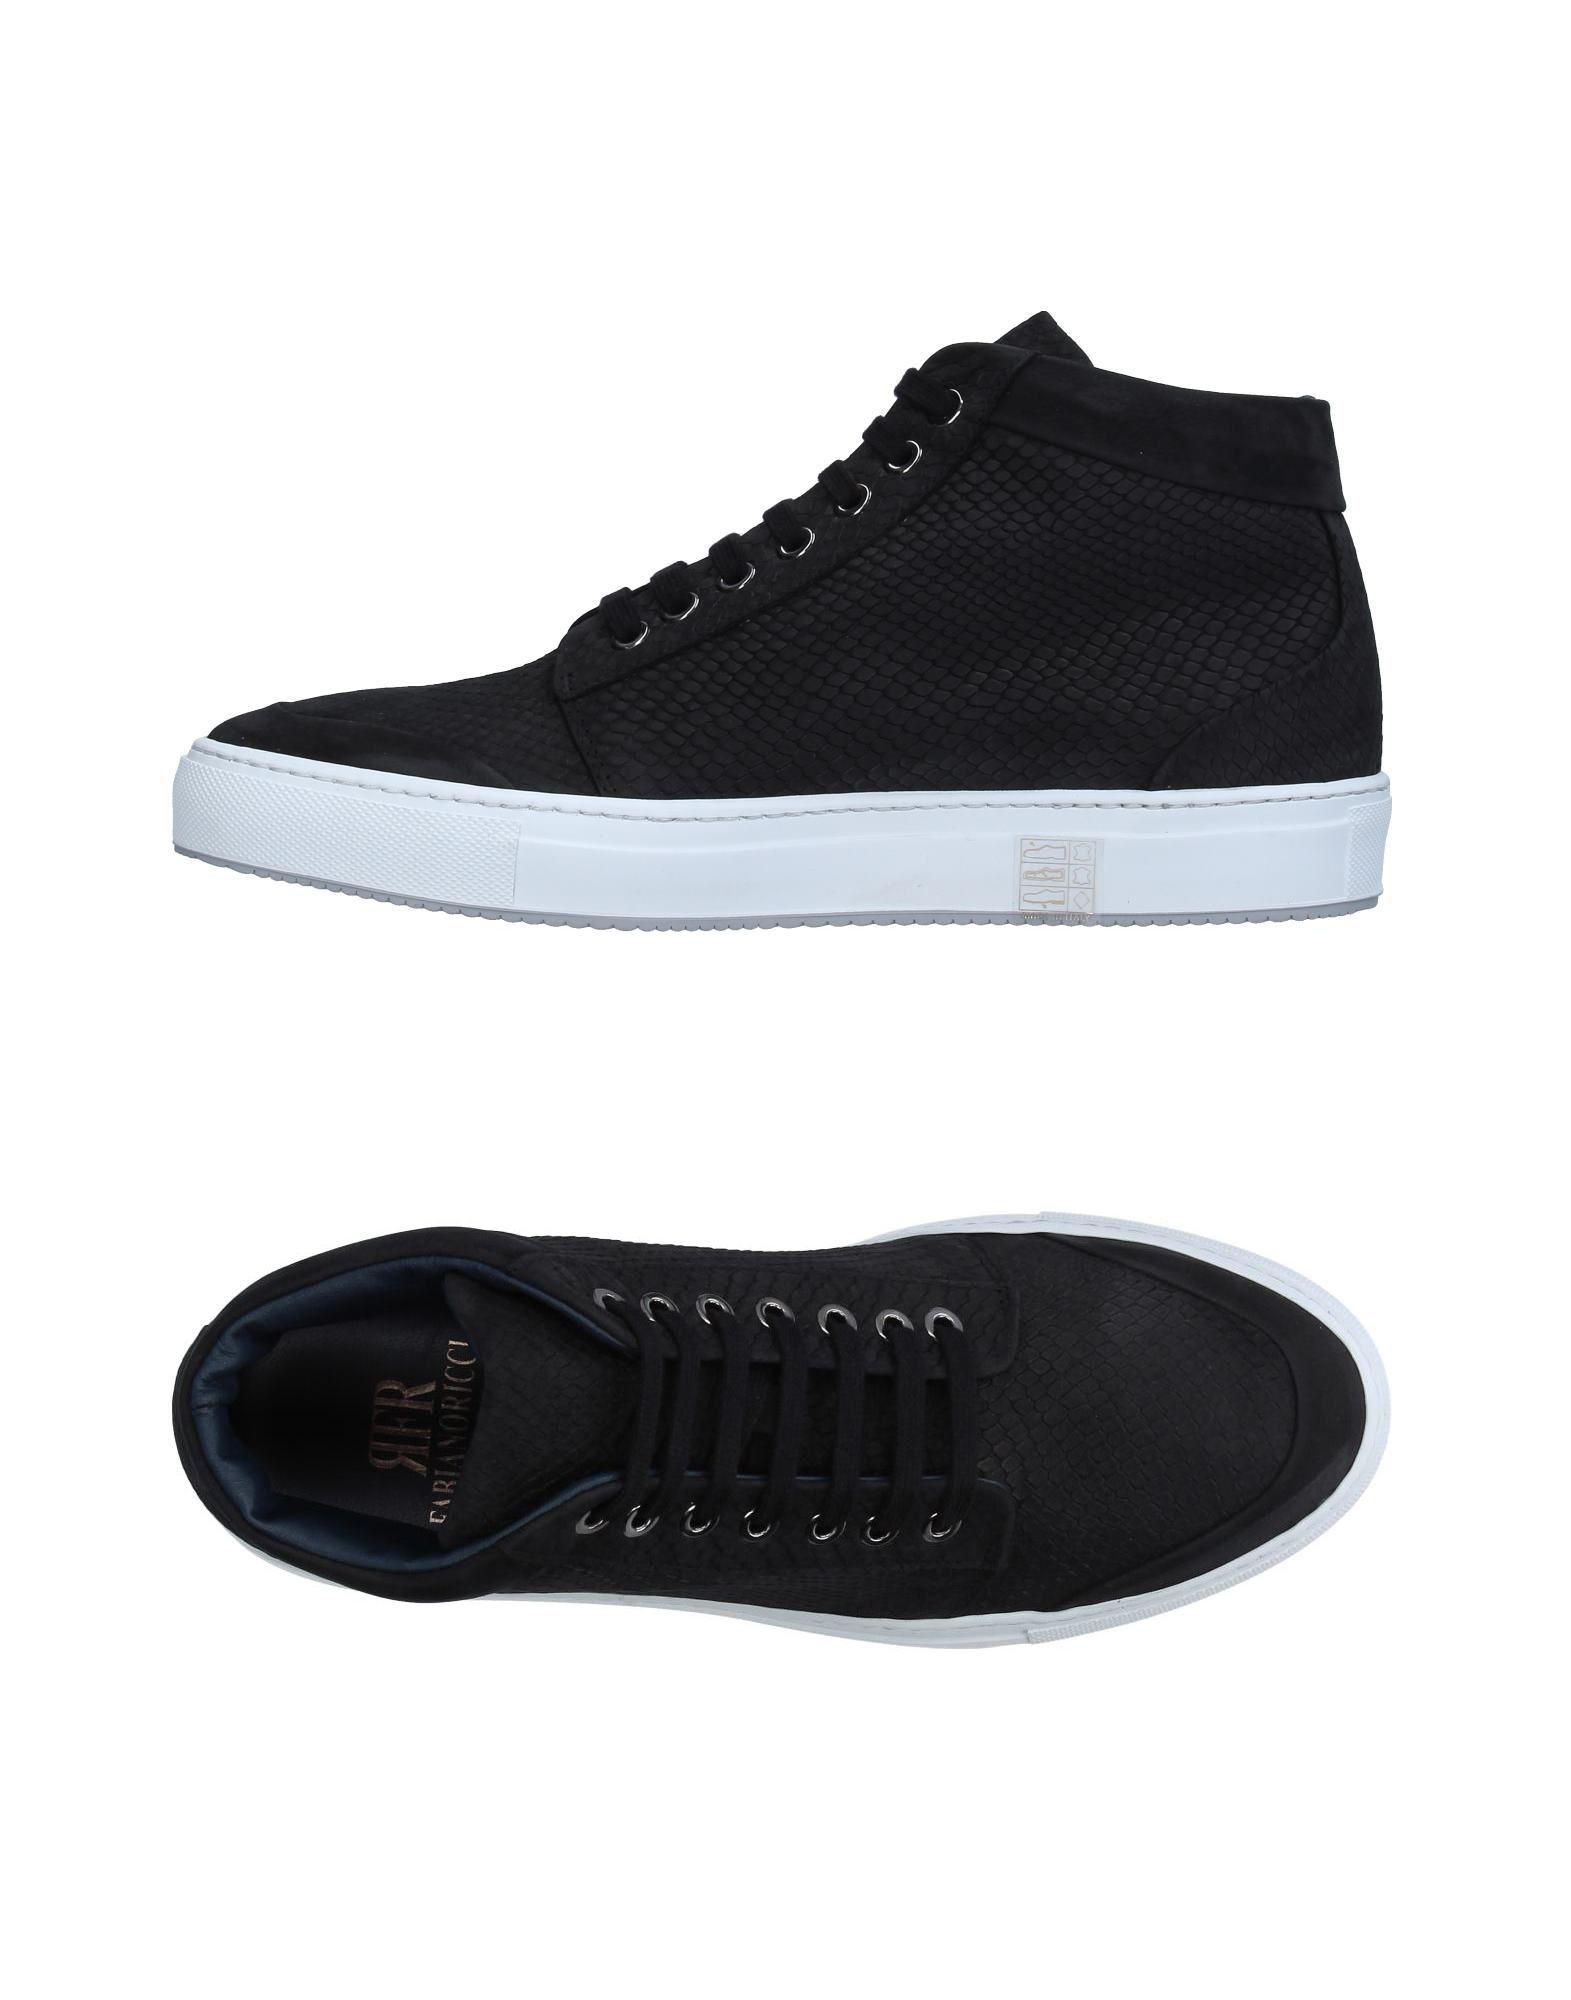 Sneakers Fabiano Ricci Homme - Sneakers Fabiano Ricci sur